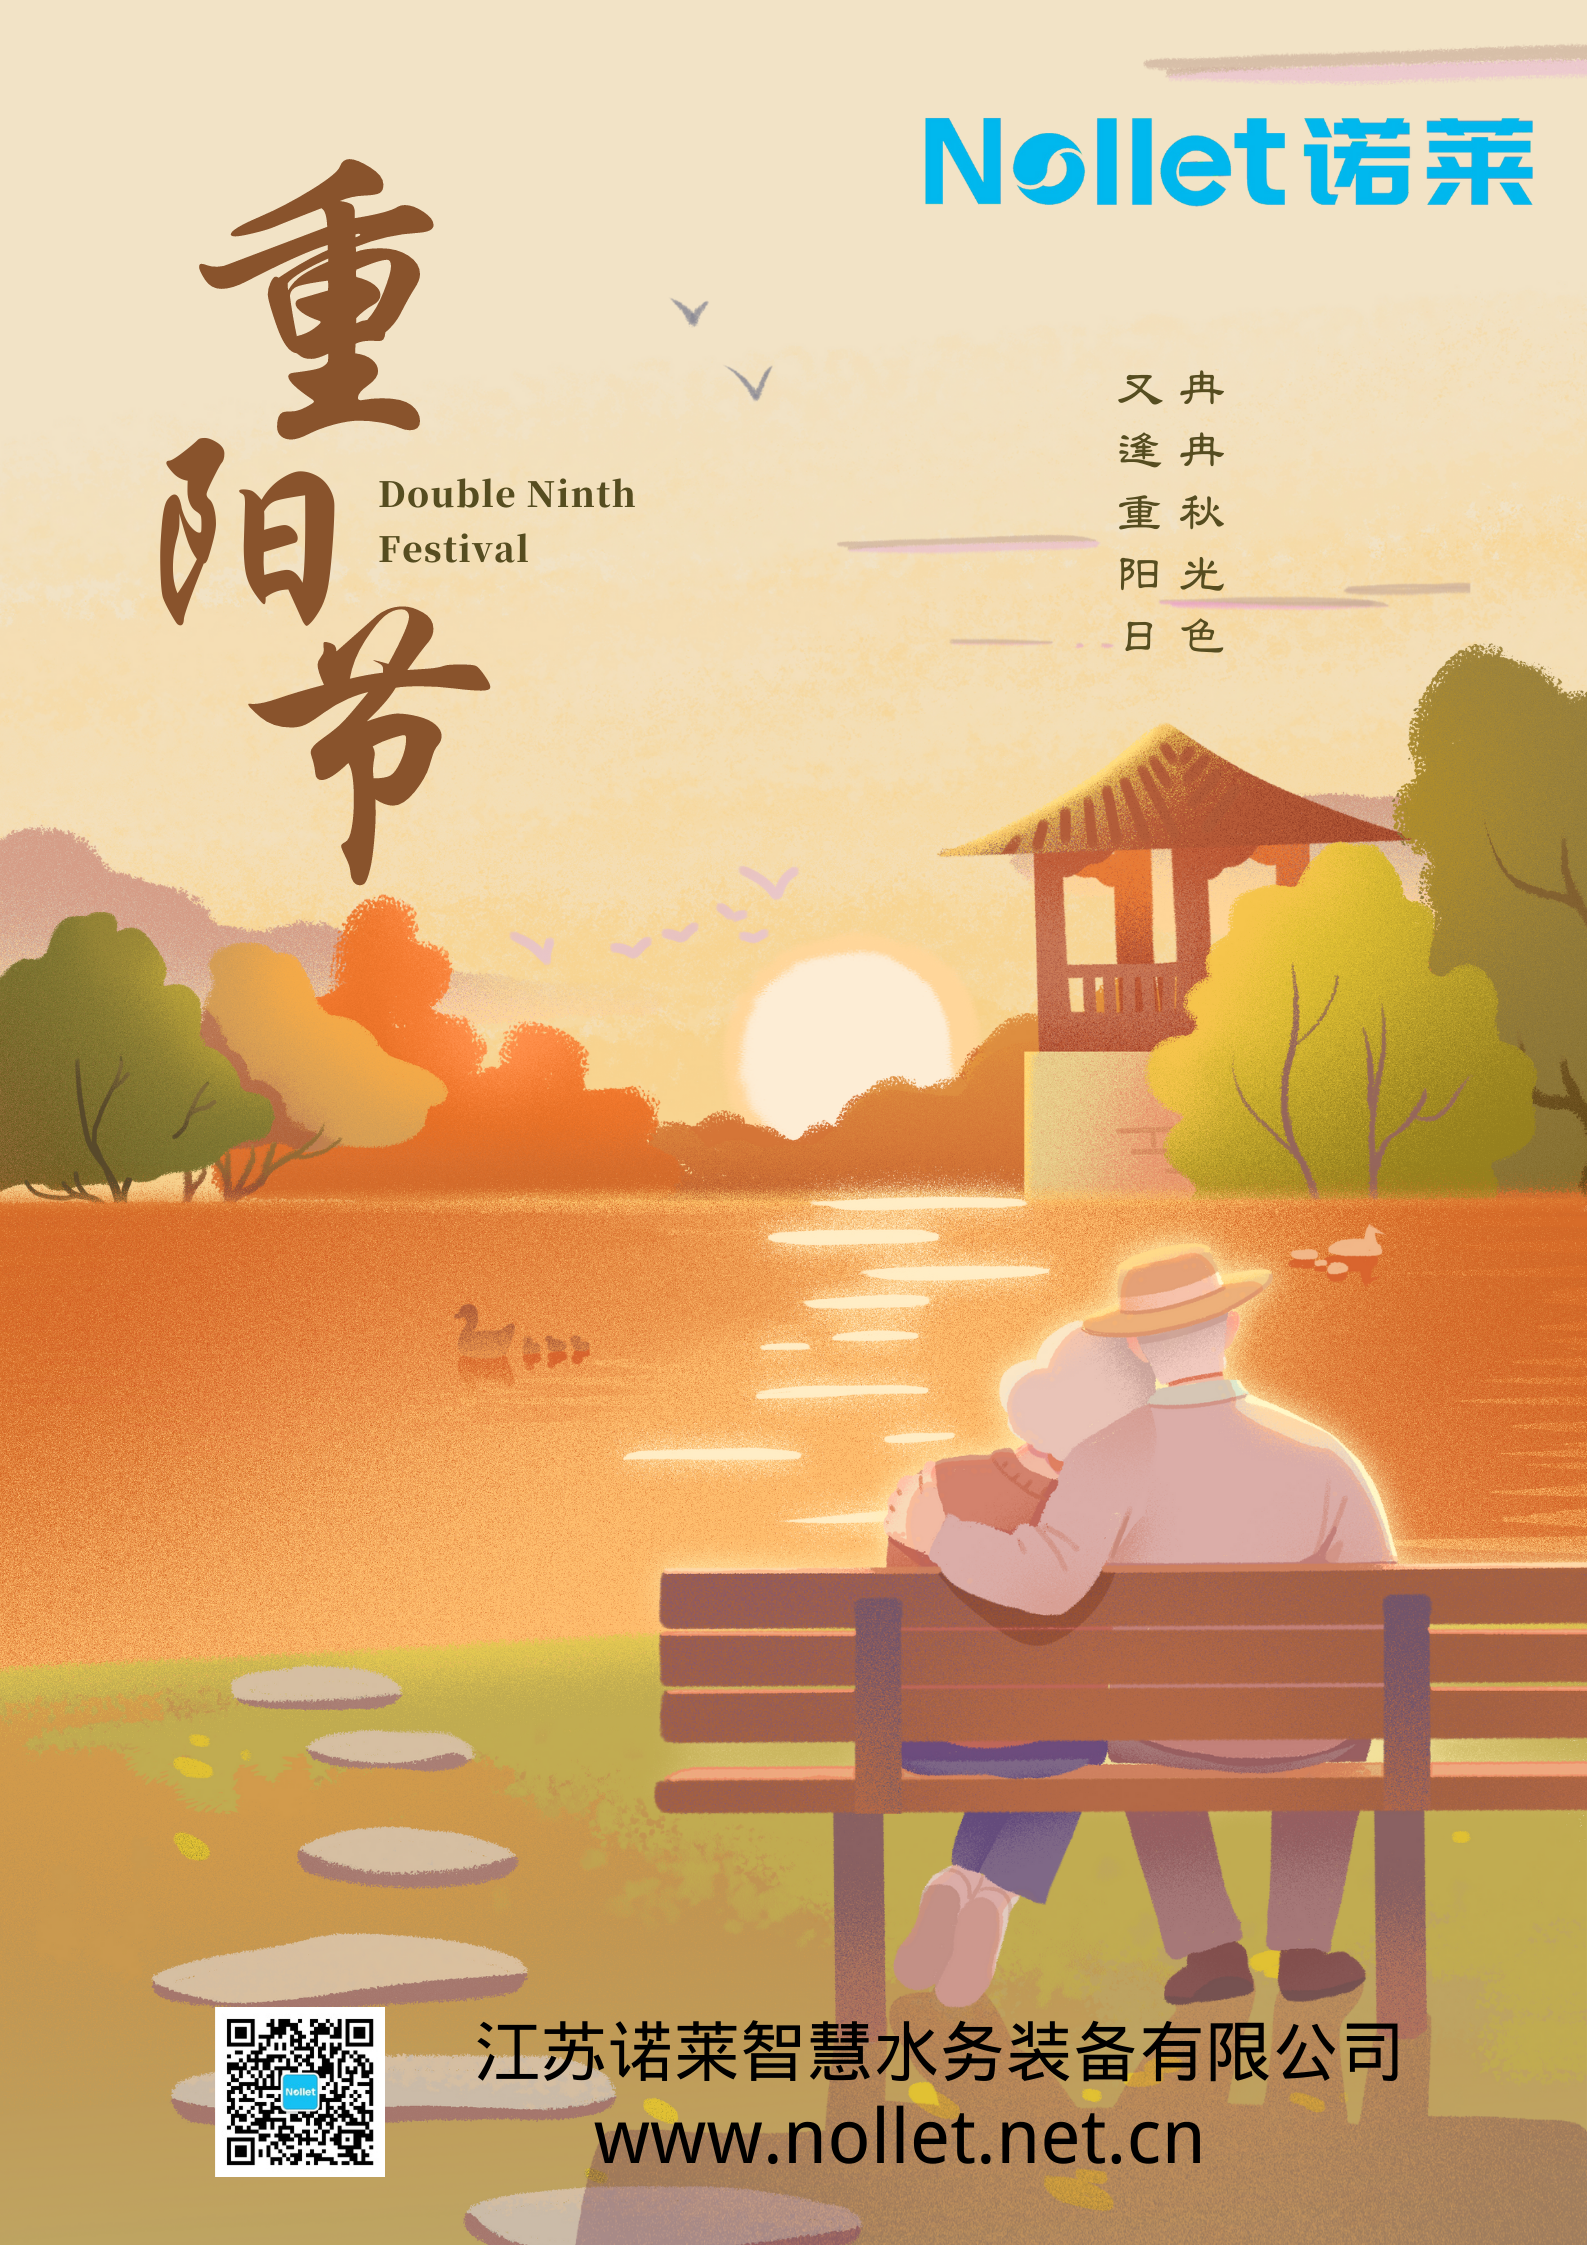 重阳节 (1).png